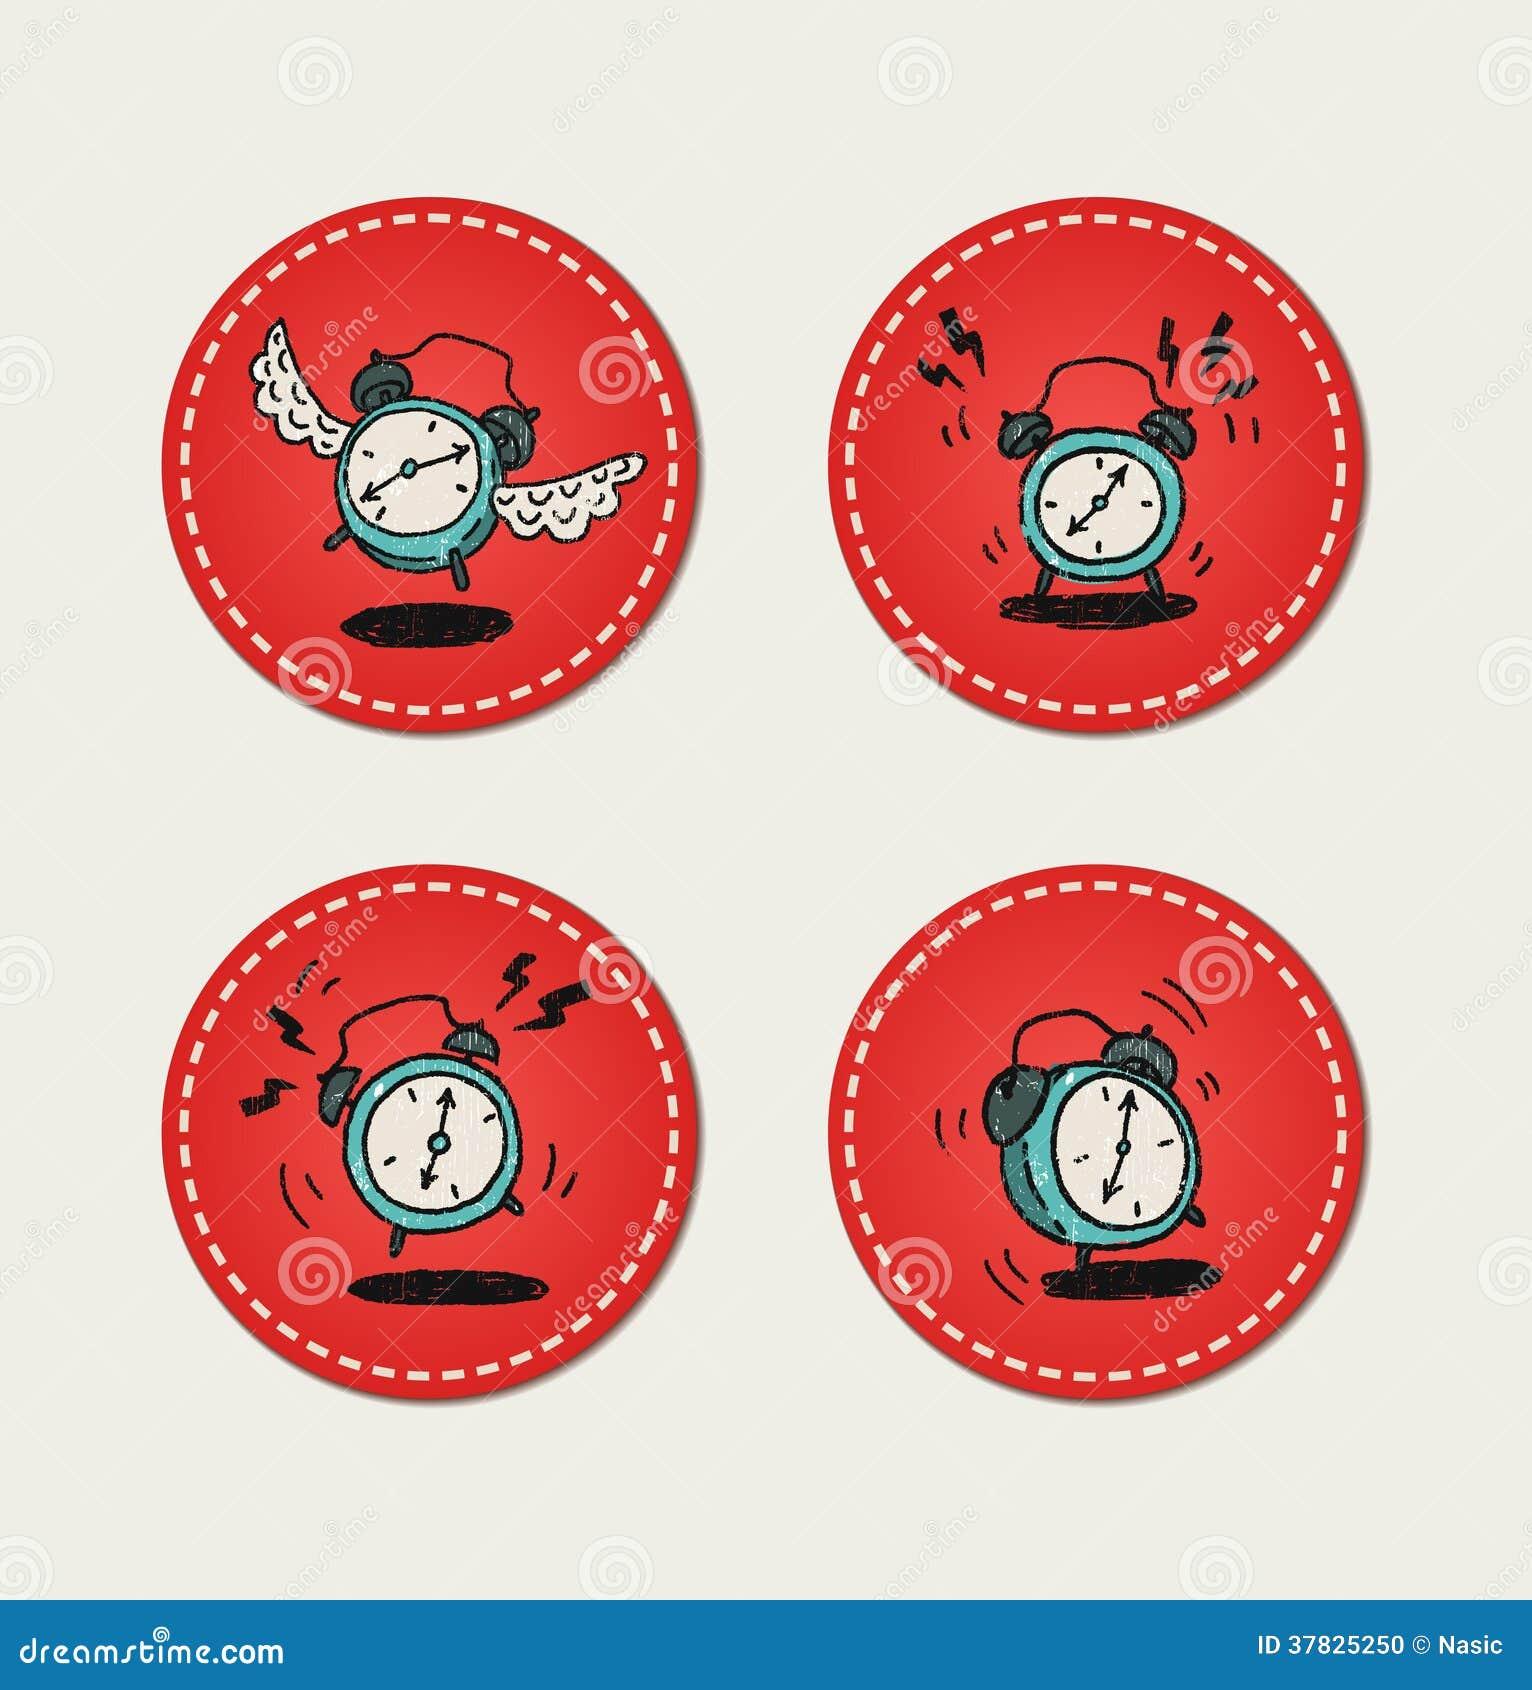 Cartoon style retro alarm clock icons